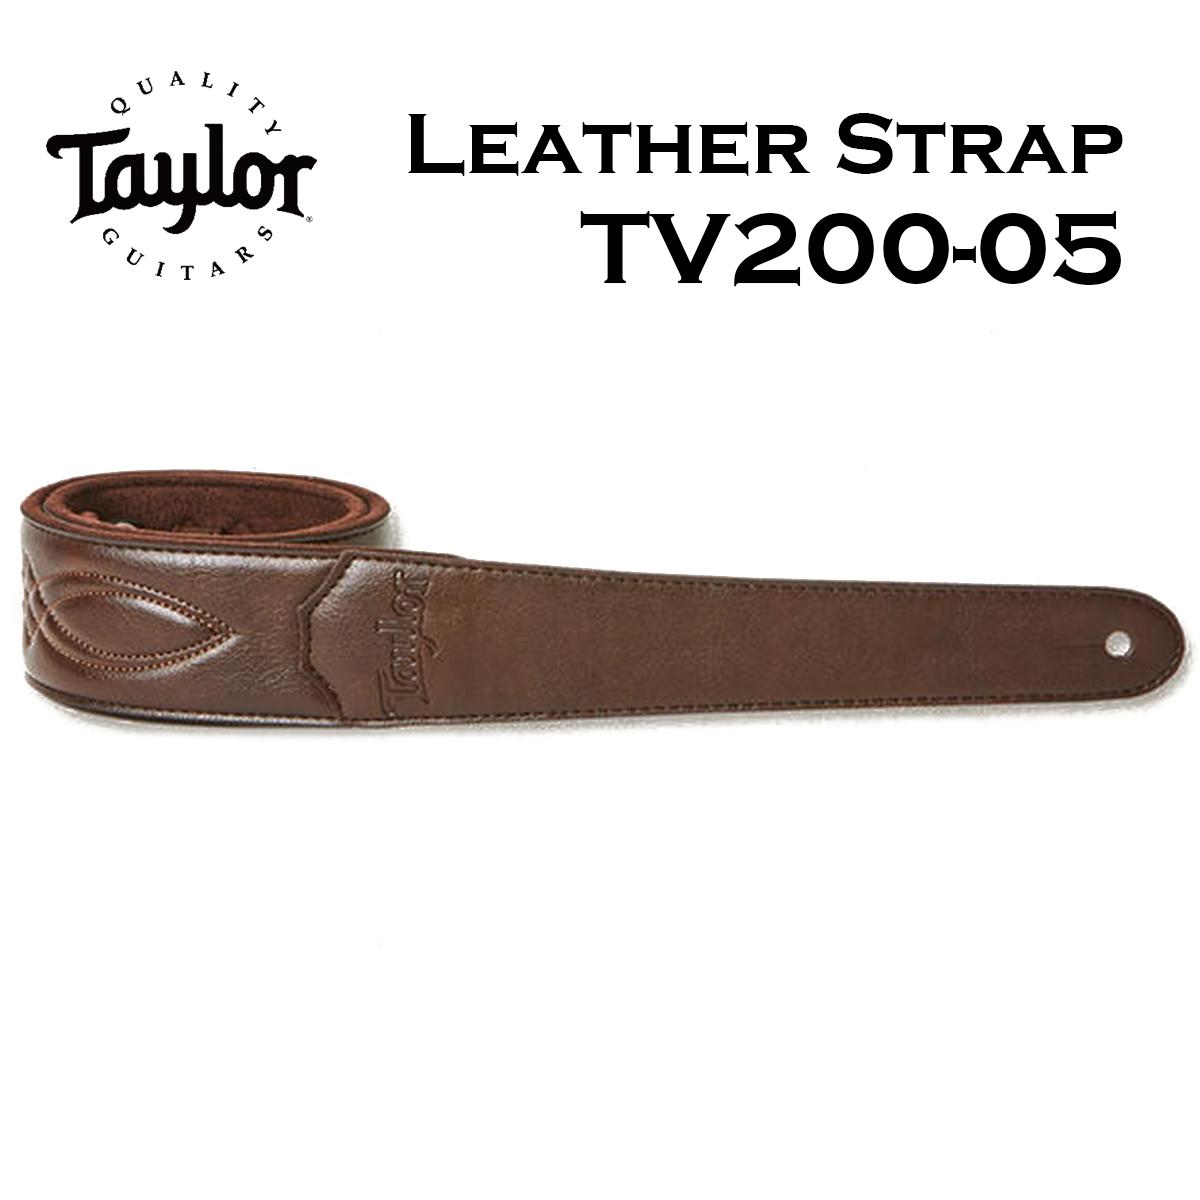 Taylor TV200-05 Vegan Leather Strap Chocolate Brown おすすめ特集 本物 2